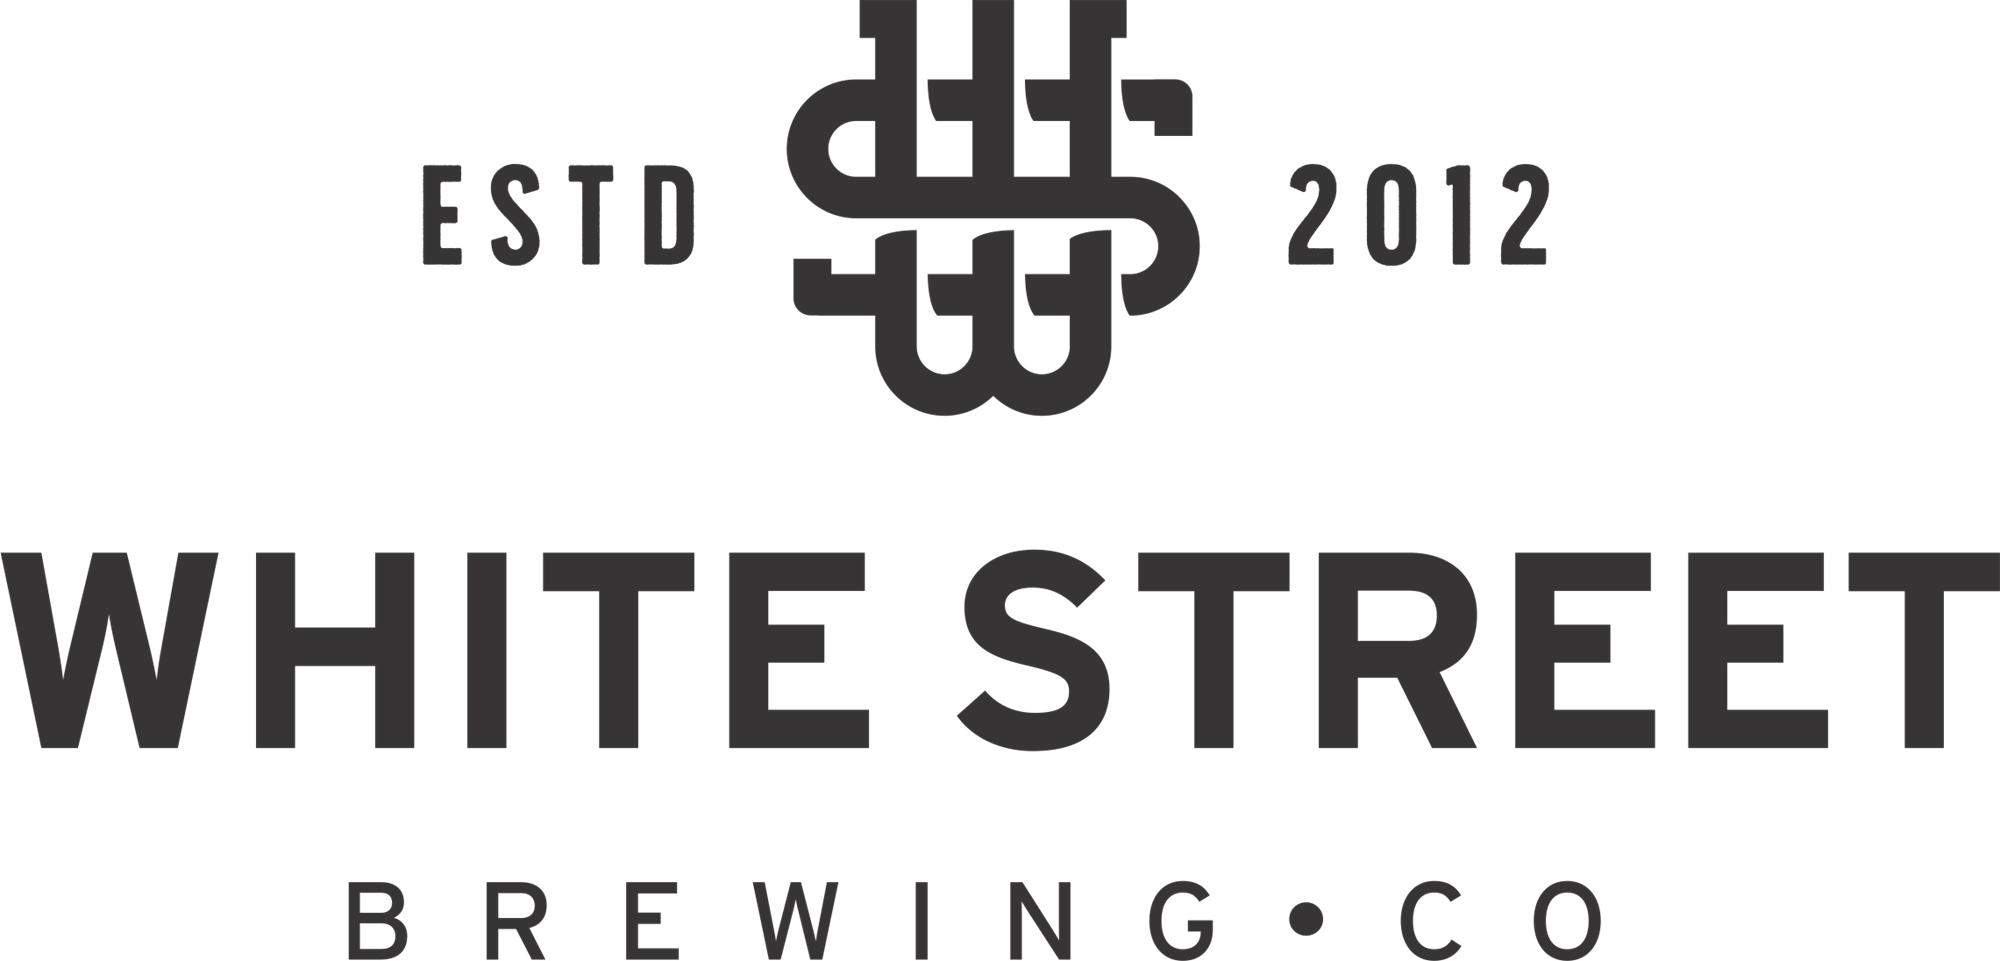 White Street Brewery